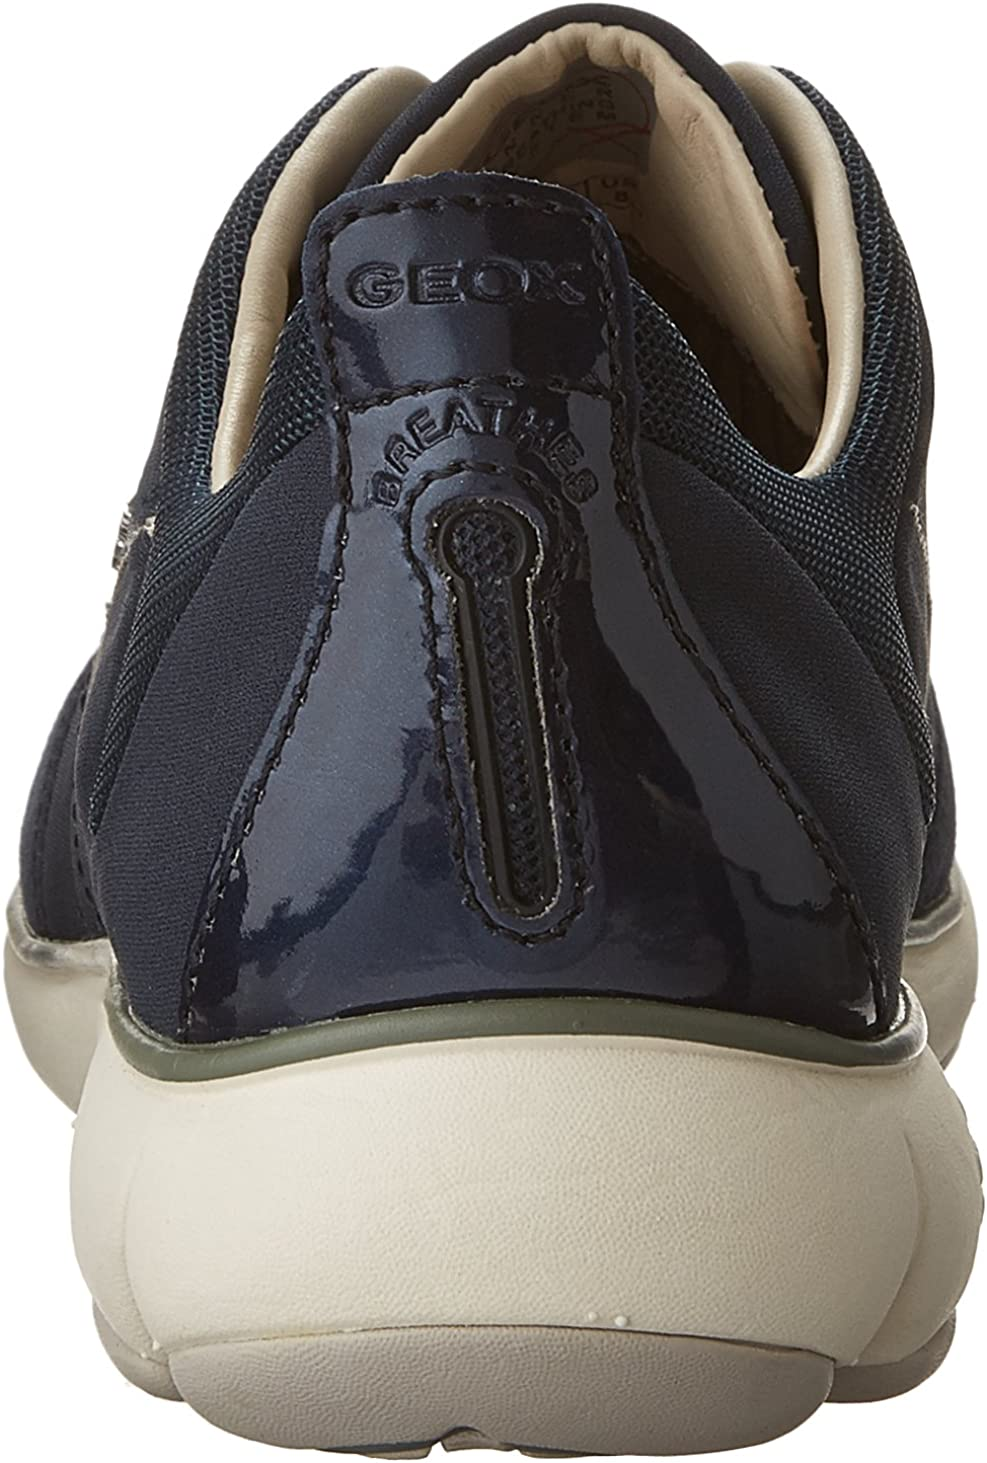 Geox Women's Wnebula9 Fashion Sneaker Navy